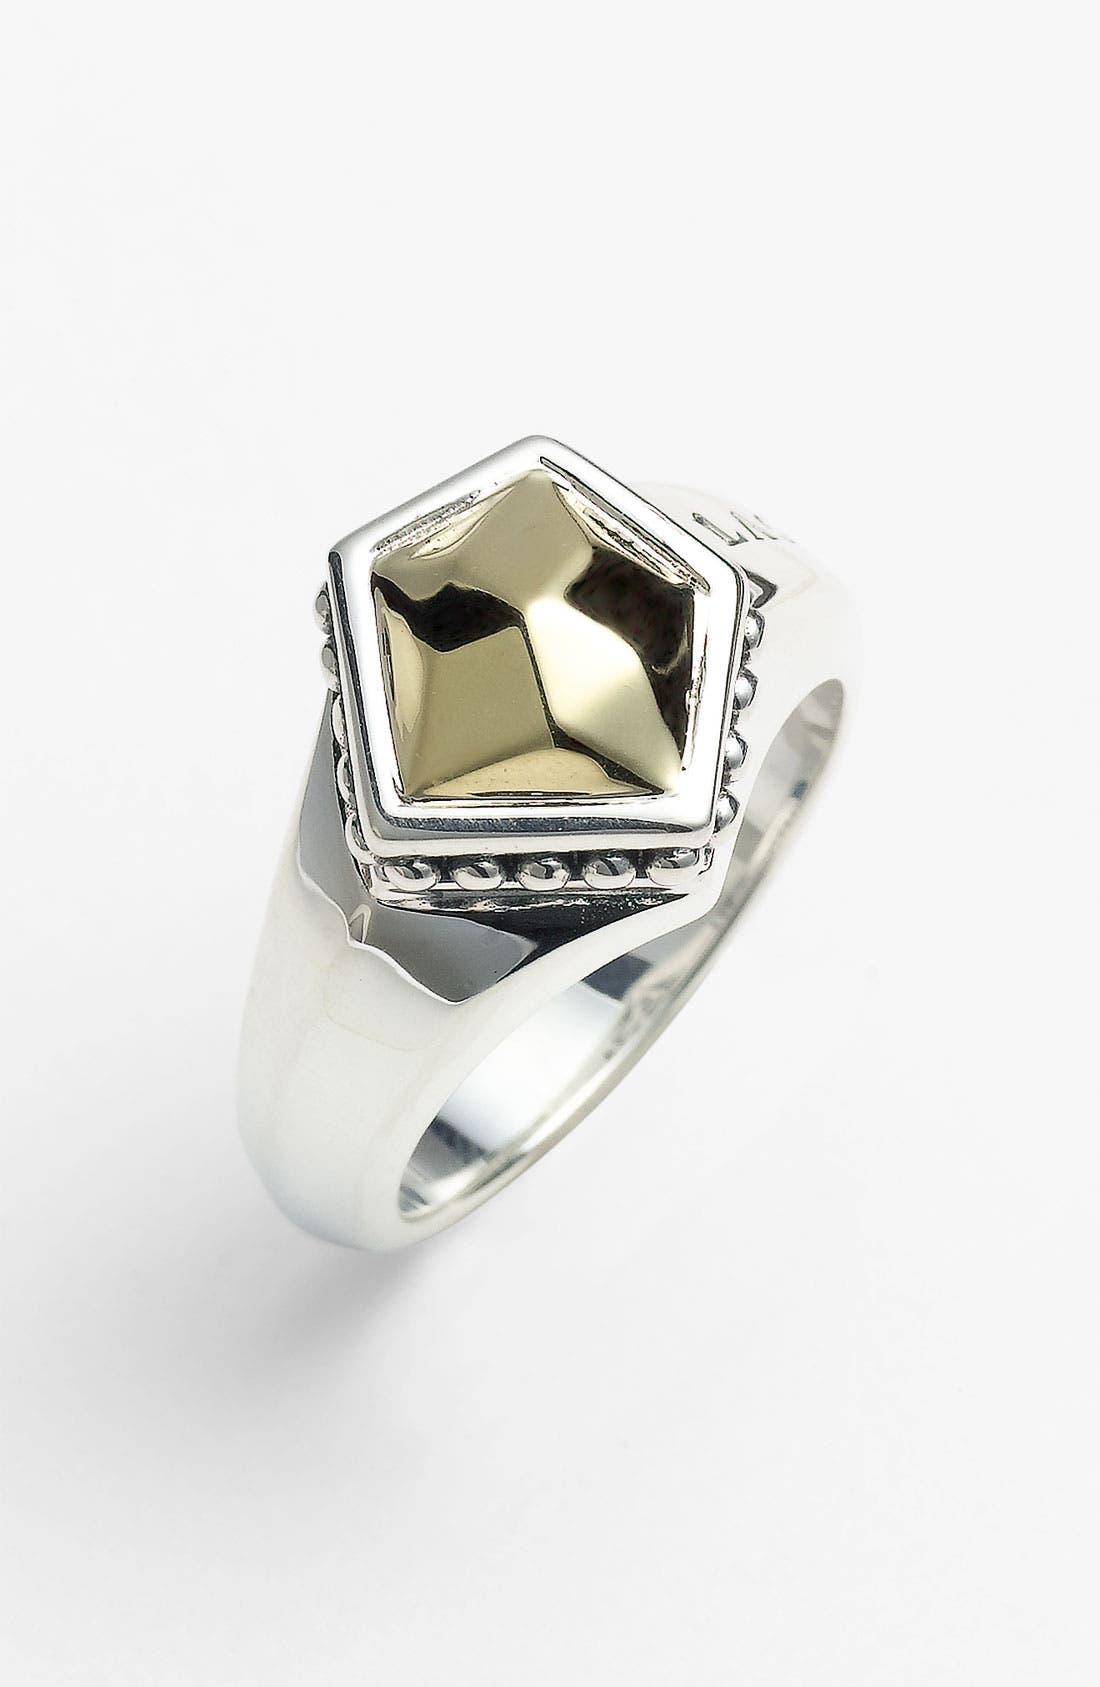 Main Image - LAGOS 'Rocks' Small Angled Two Tone Ring